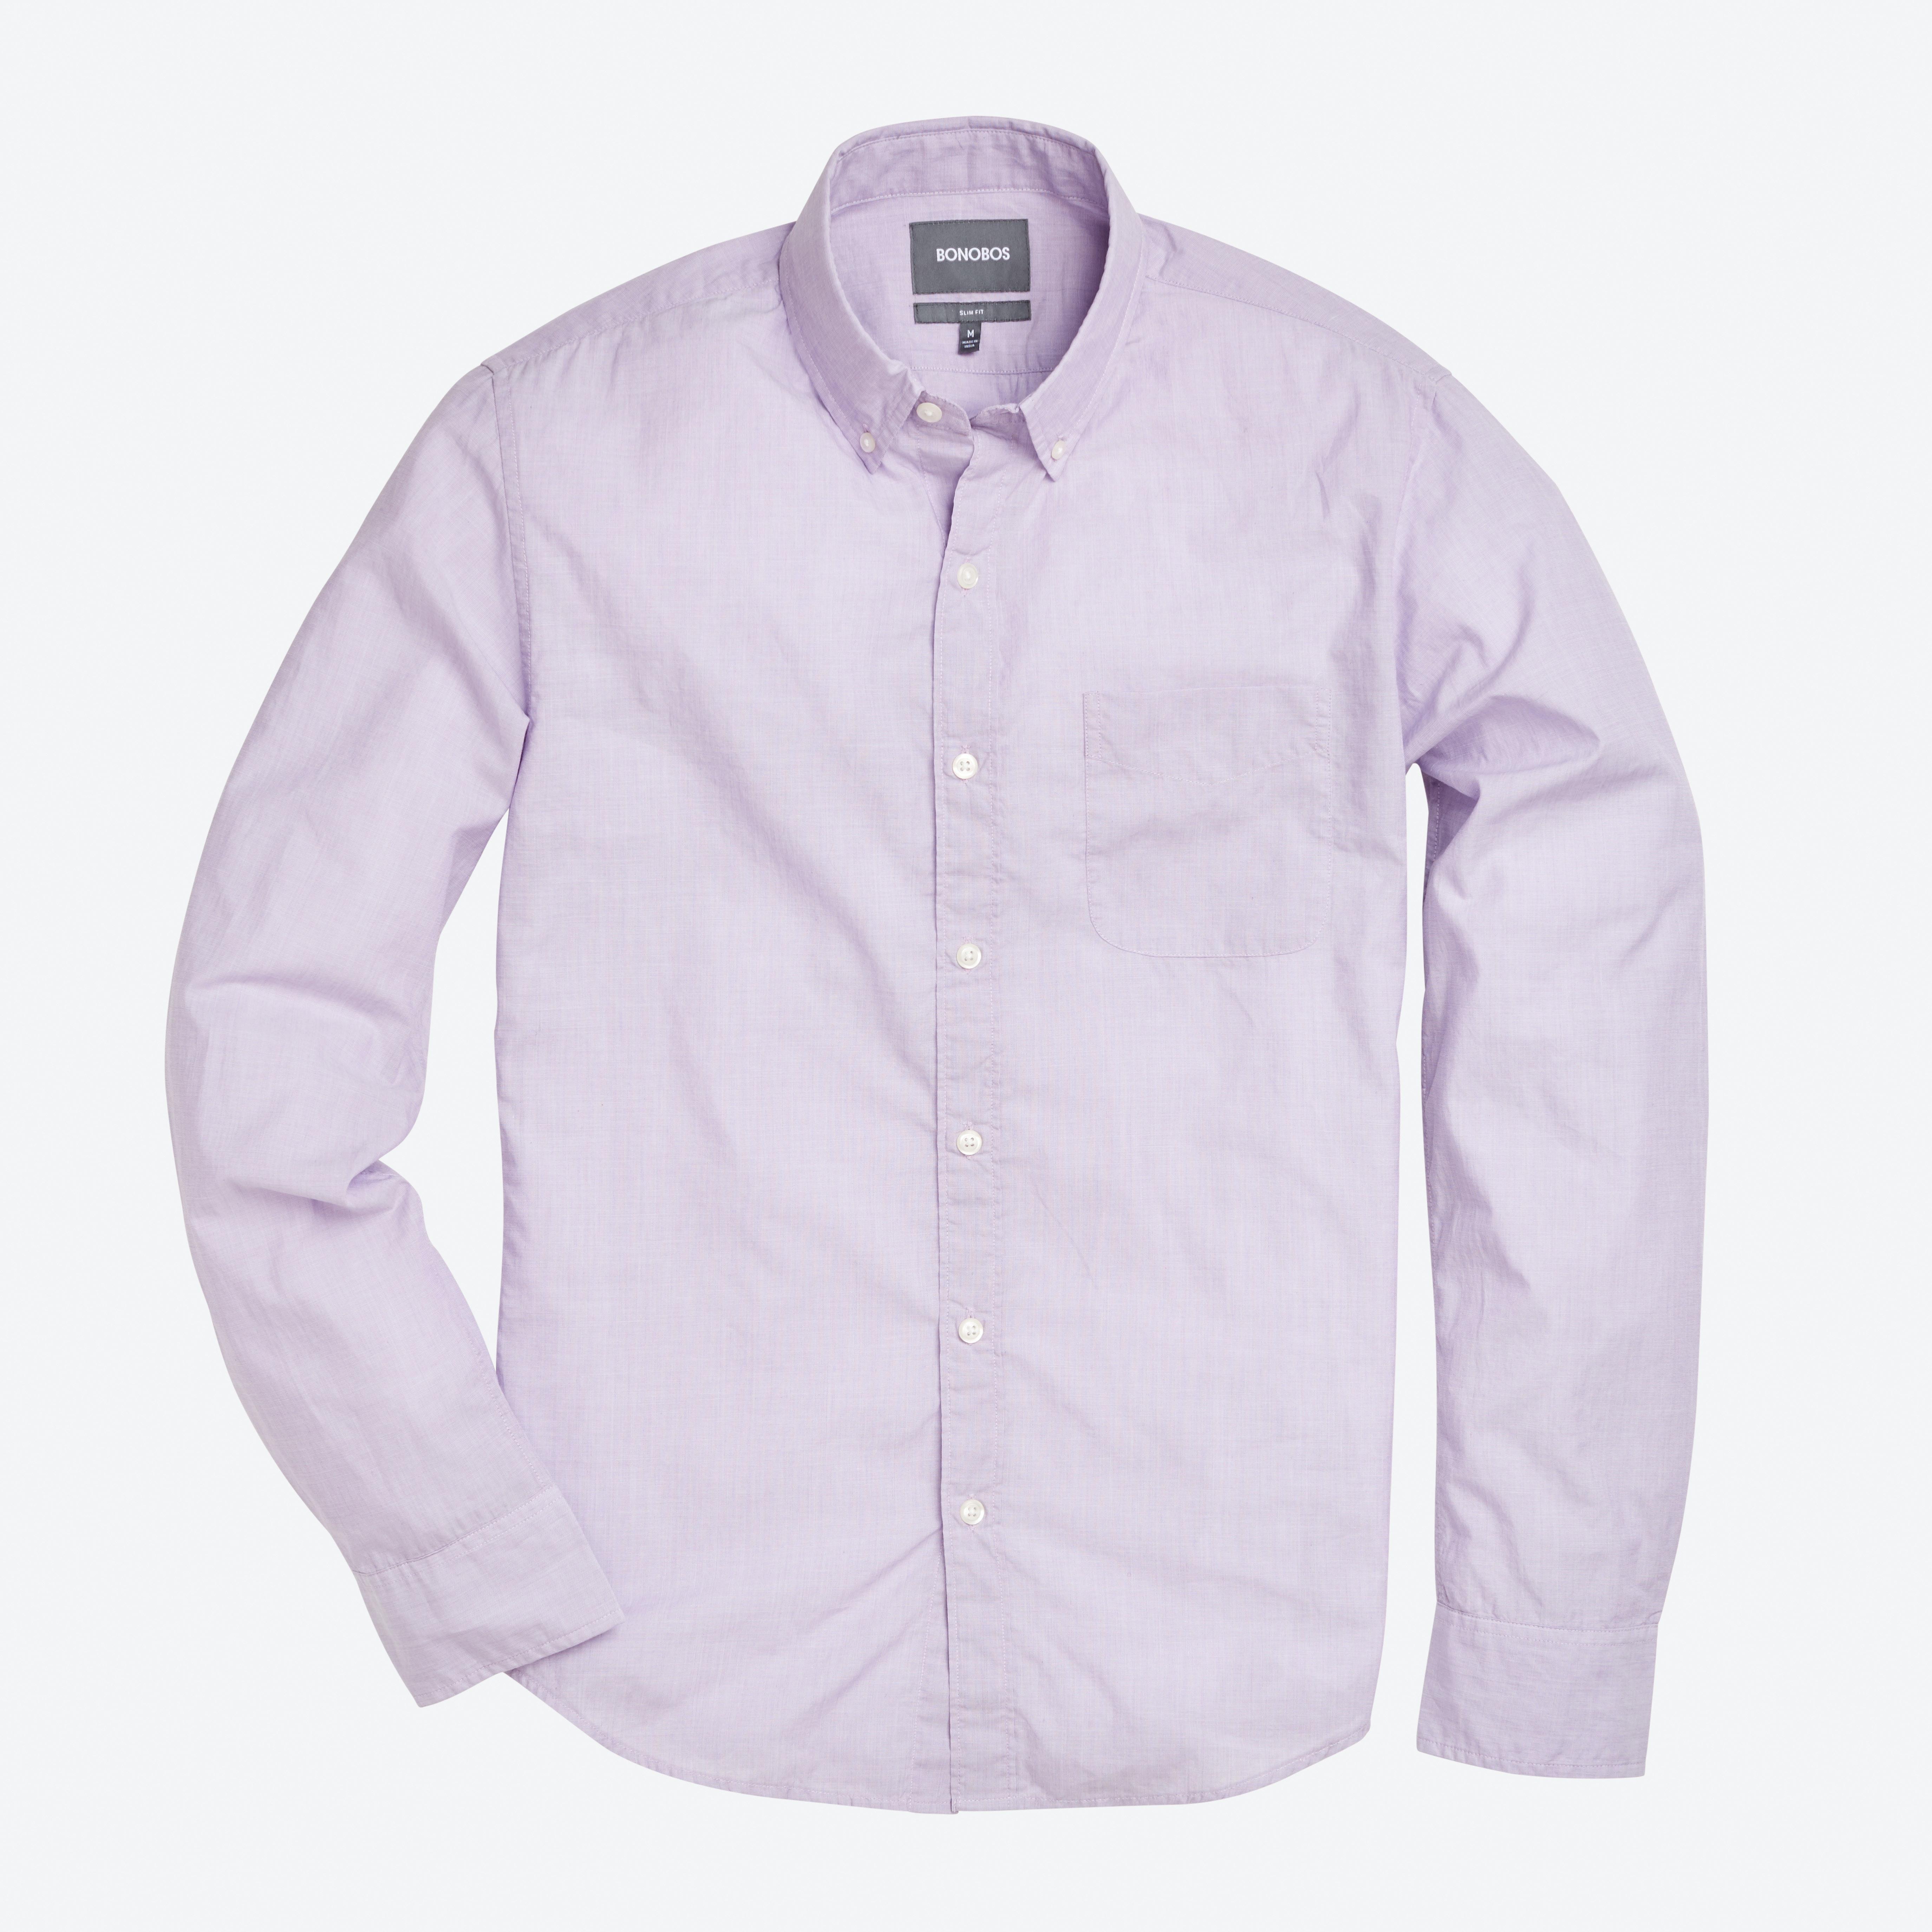 Purple dress shirt images